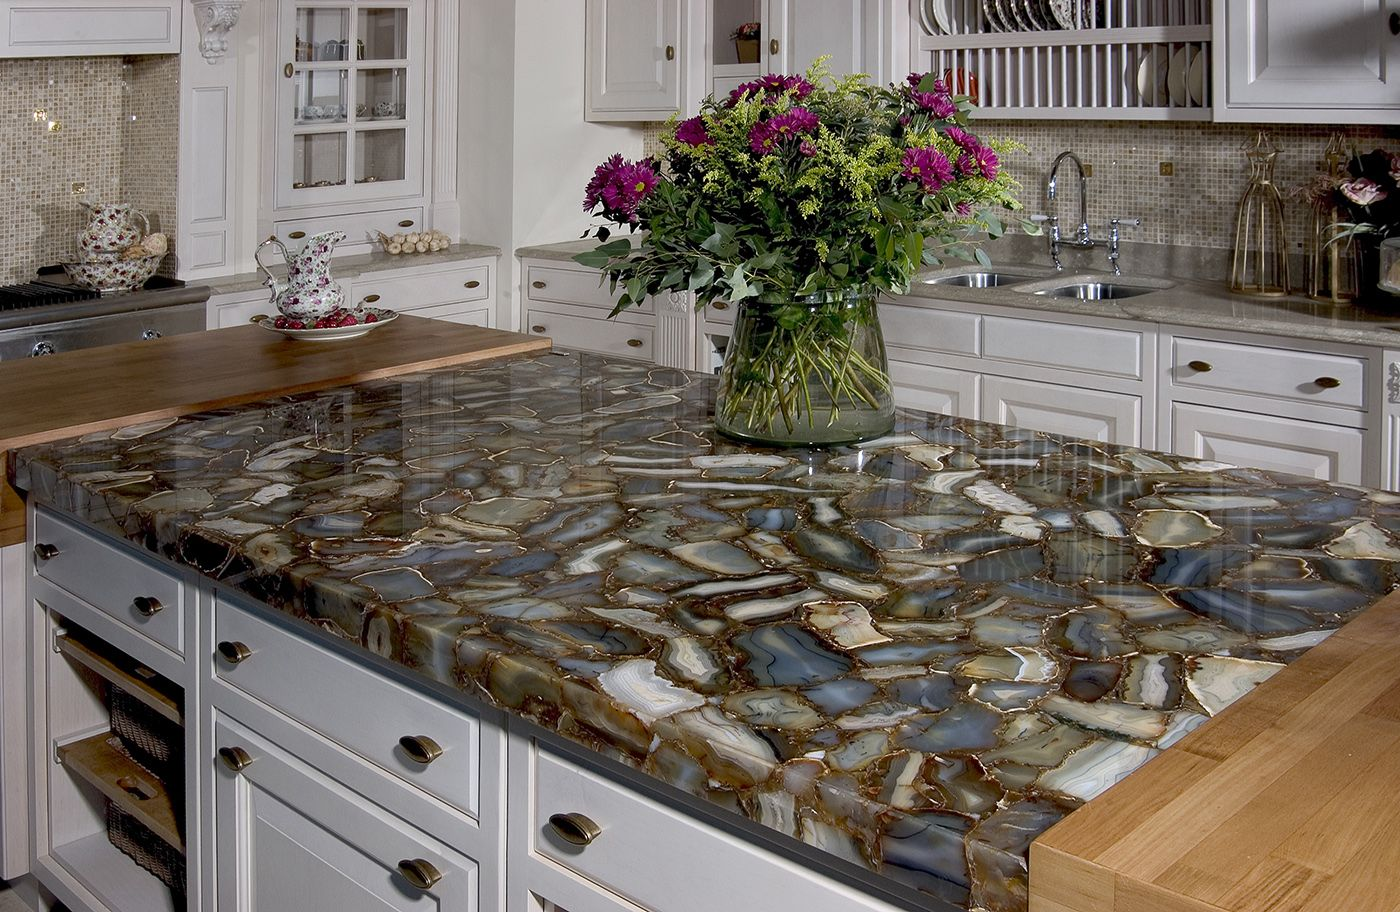 Keystone Granite Granite Fabricator In San Antonio Texas Replacing Kitchen Countertops Kitchen Cabinets And Countertops Kitchen Countertops